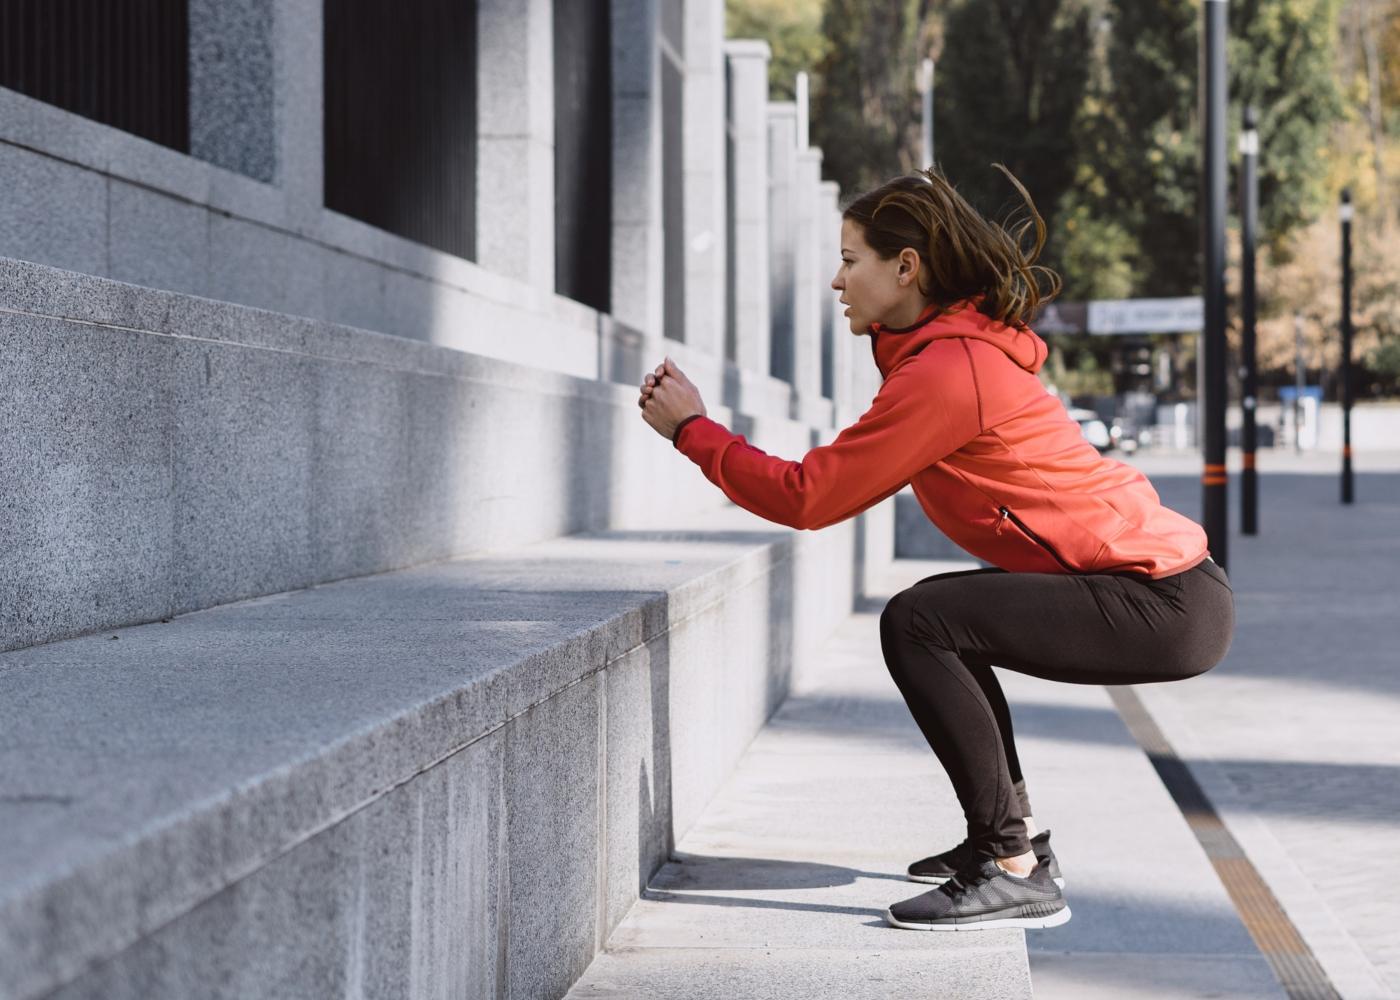 Mulher a treinar na rua